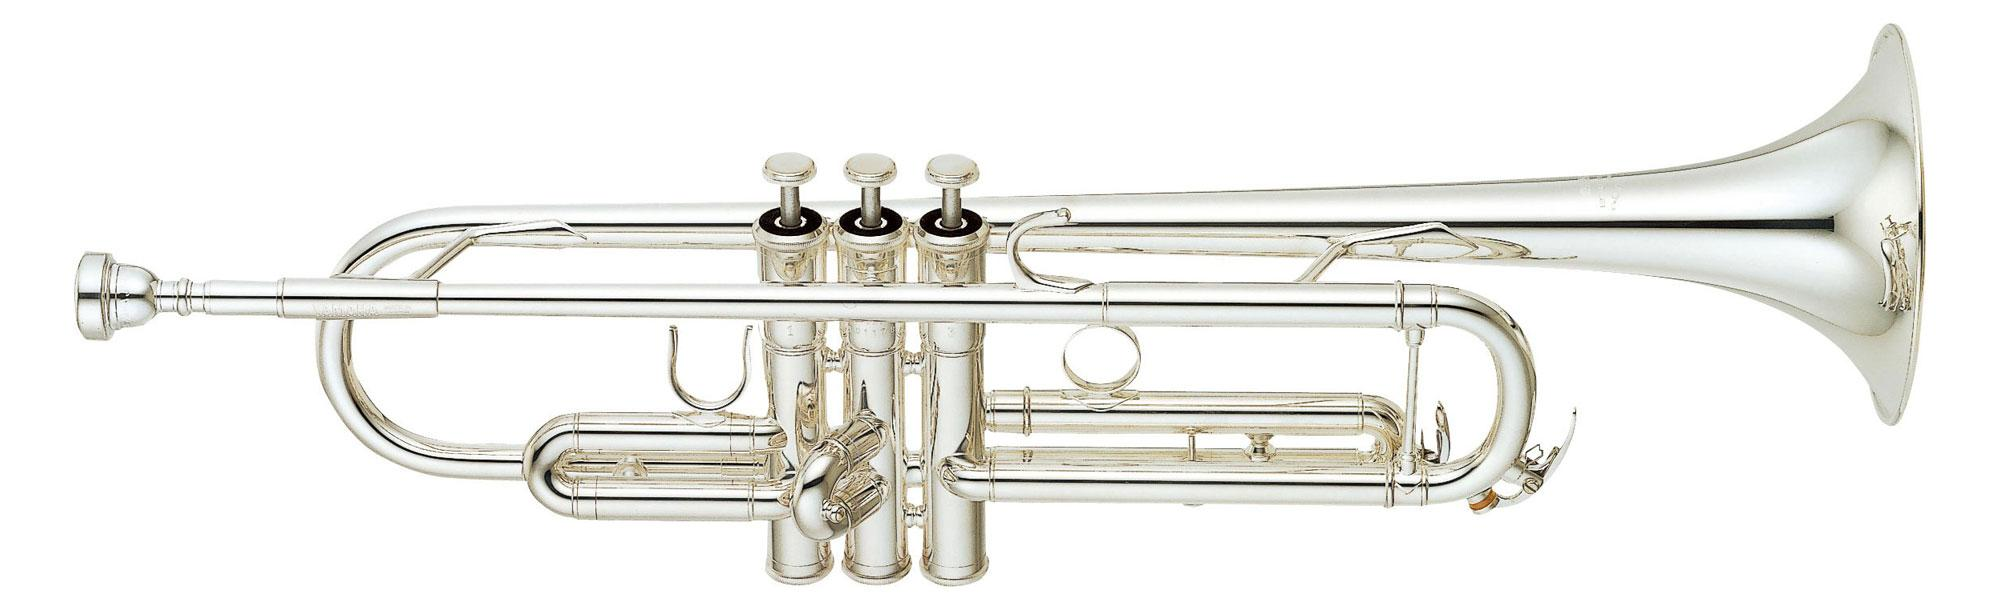 Trompeten - Yamaha Professional YTR 6335 S Bb Trompete versilbert - Onlineshop Musikhaus Kirstein